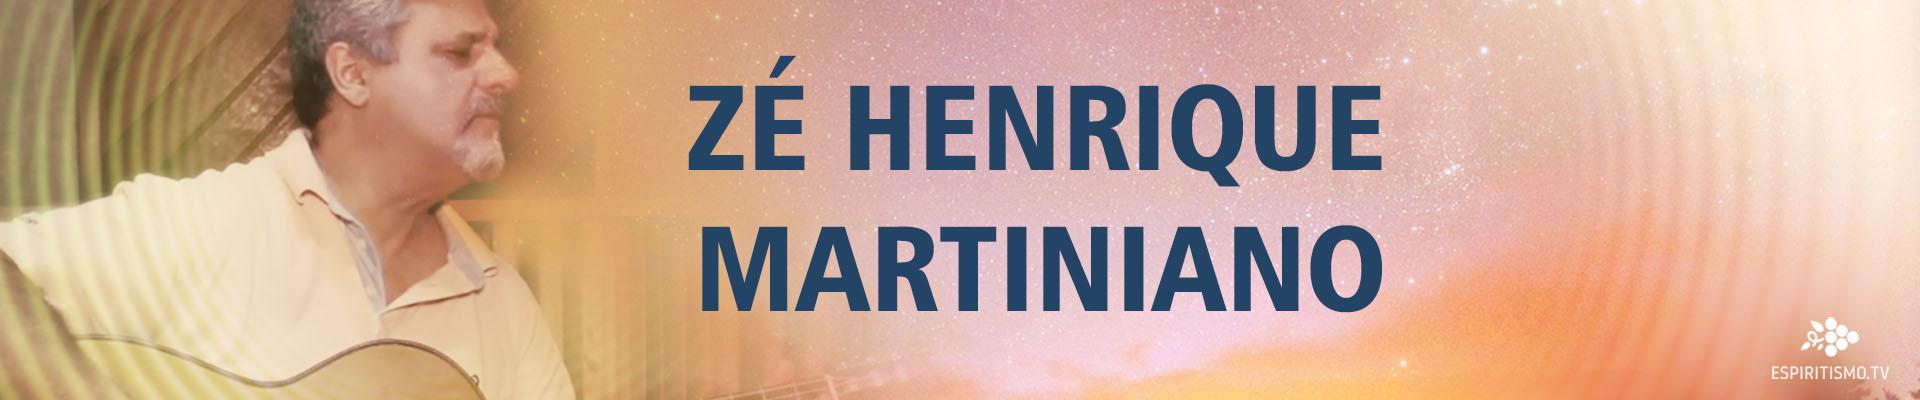 Zé Henrique Martiniano 1